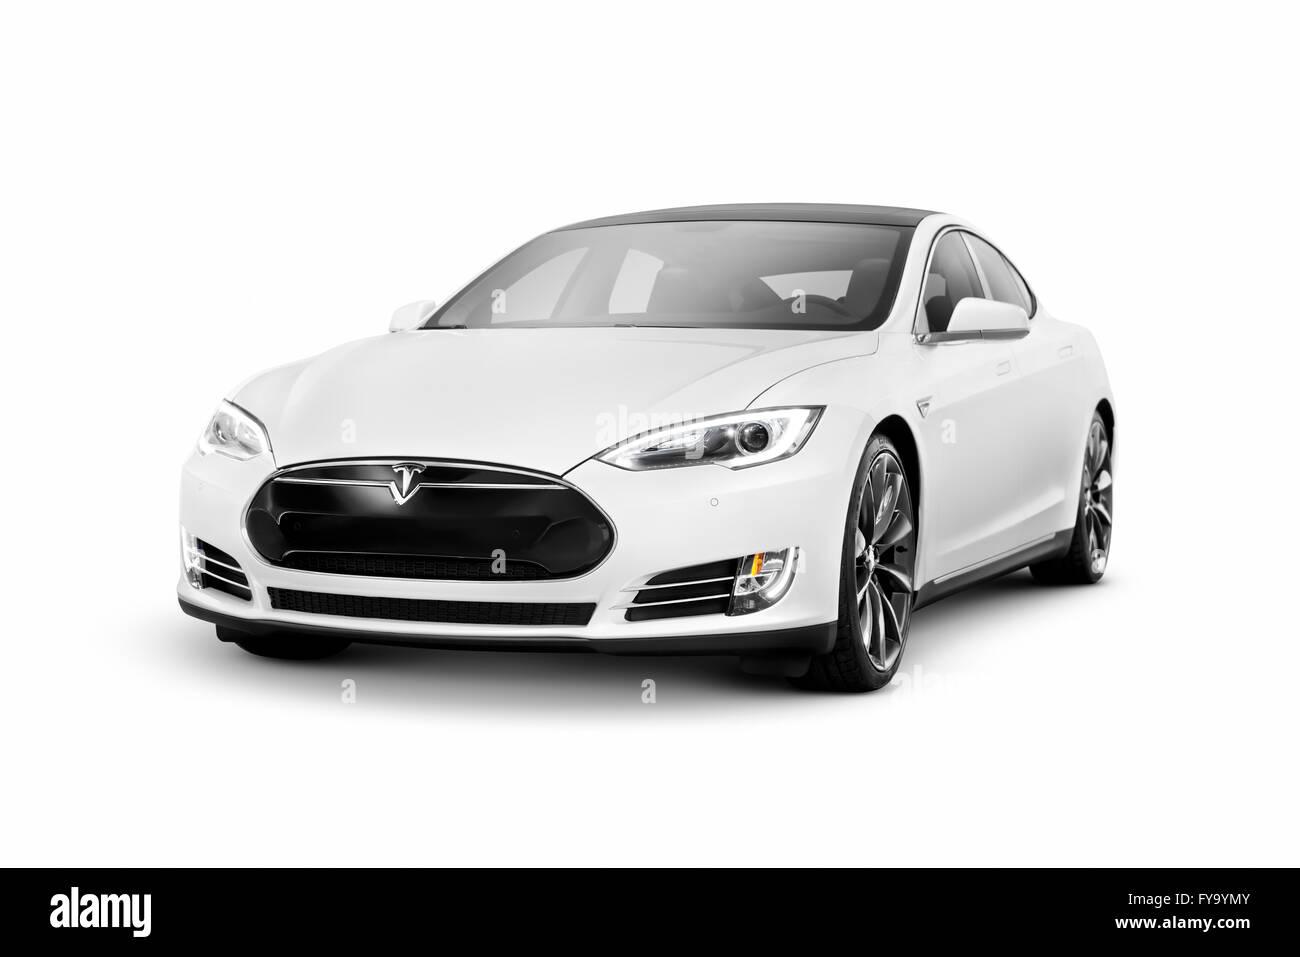 White 2014 Tesla Model S luxury auto elettrica berlina premium Immagini Stock